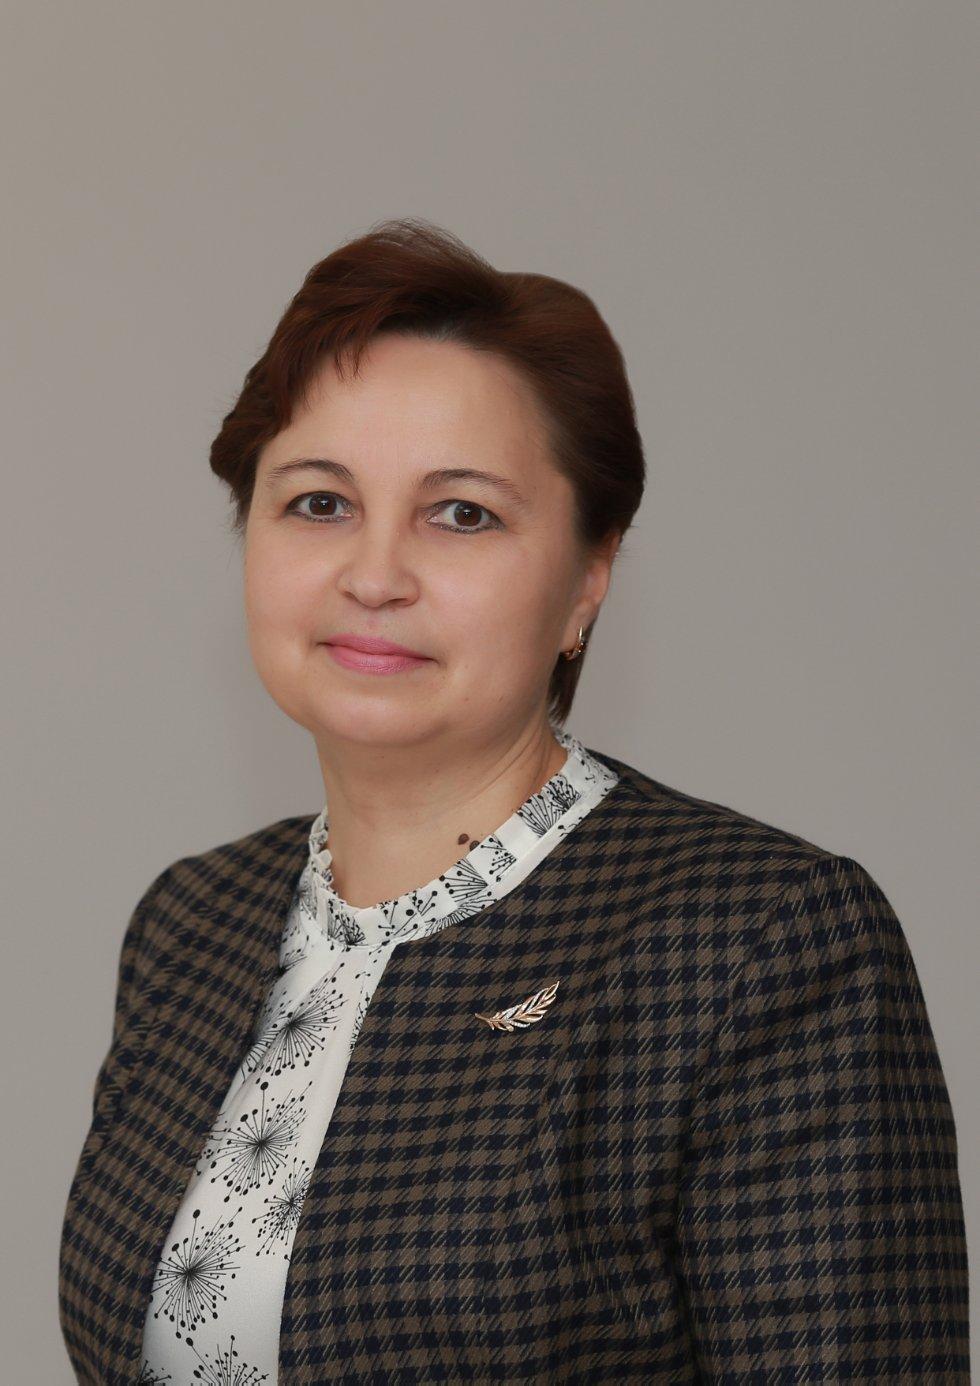 Kadyrova Farida Zaditovna